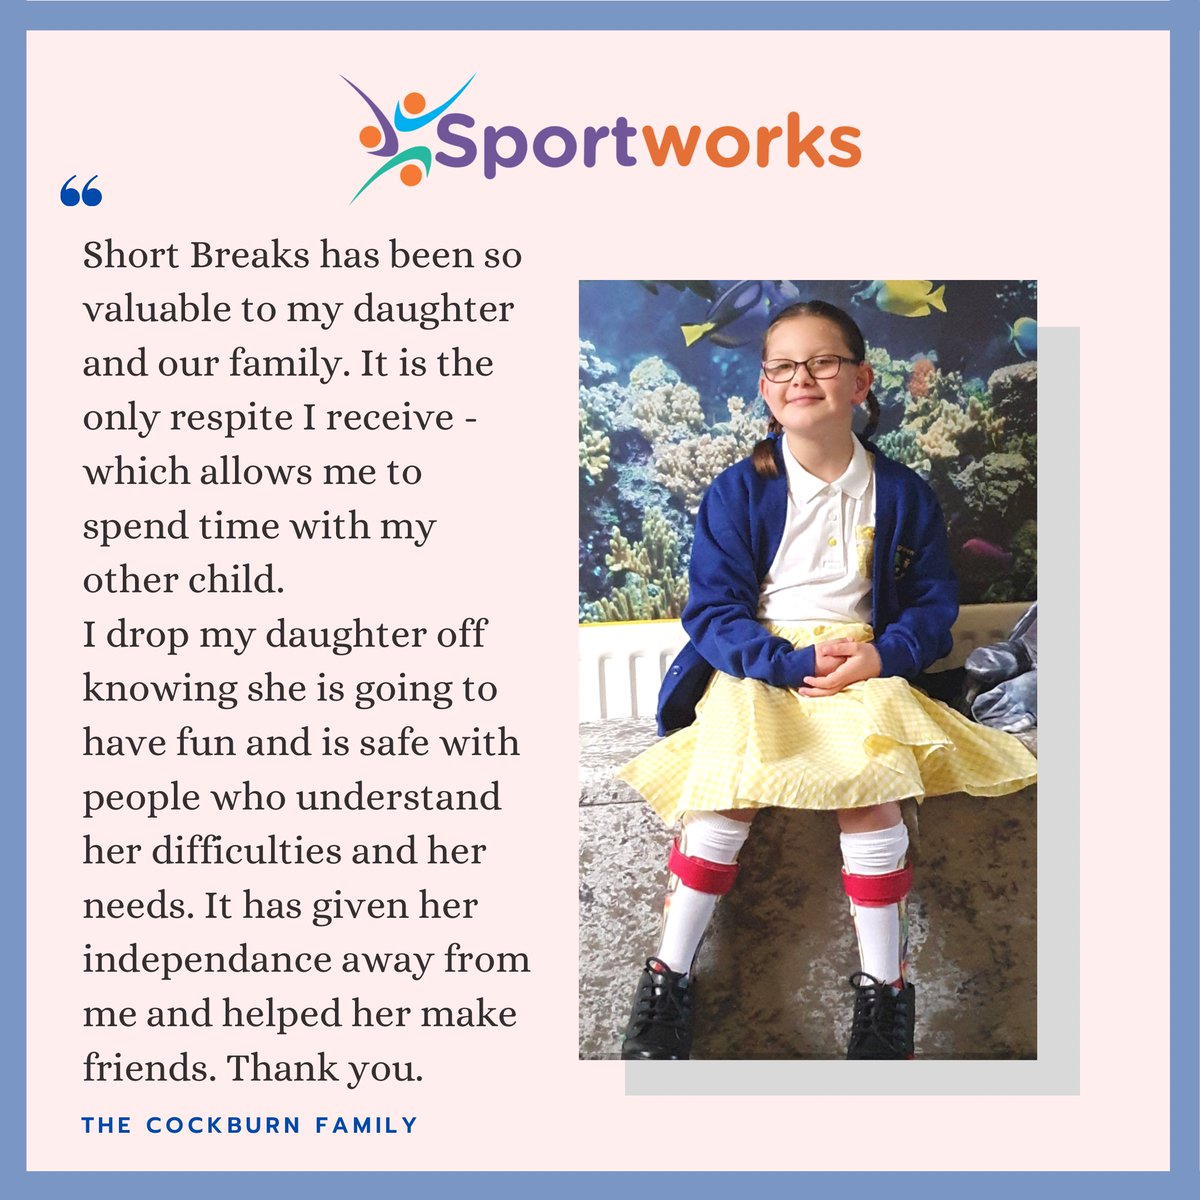 SportWorks photo